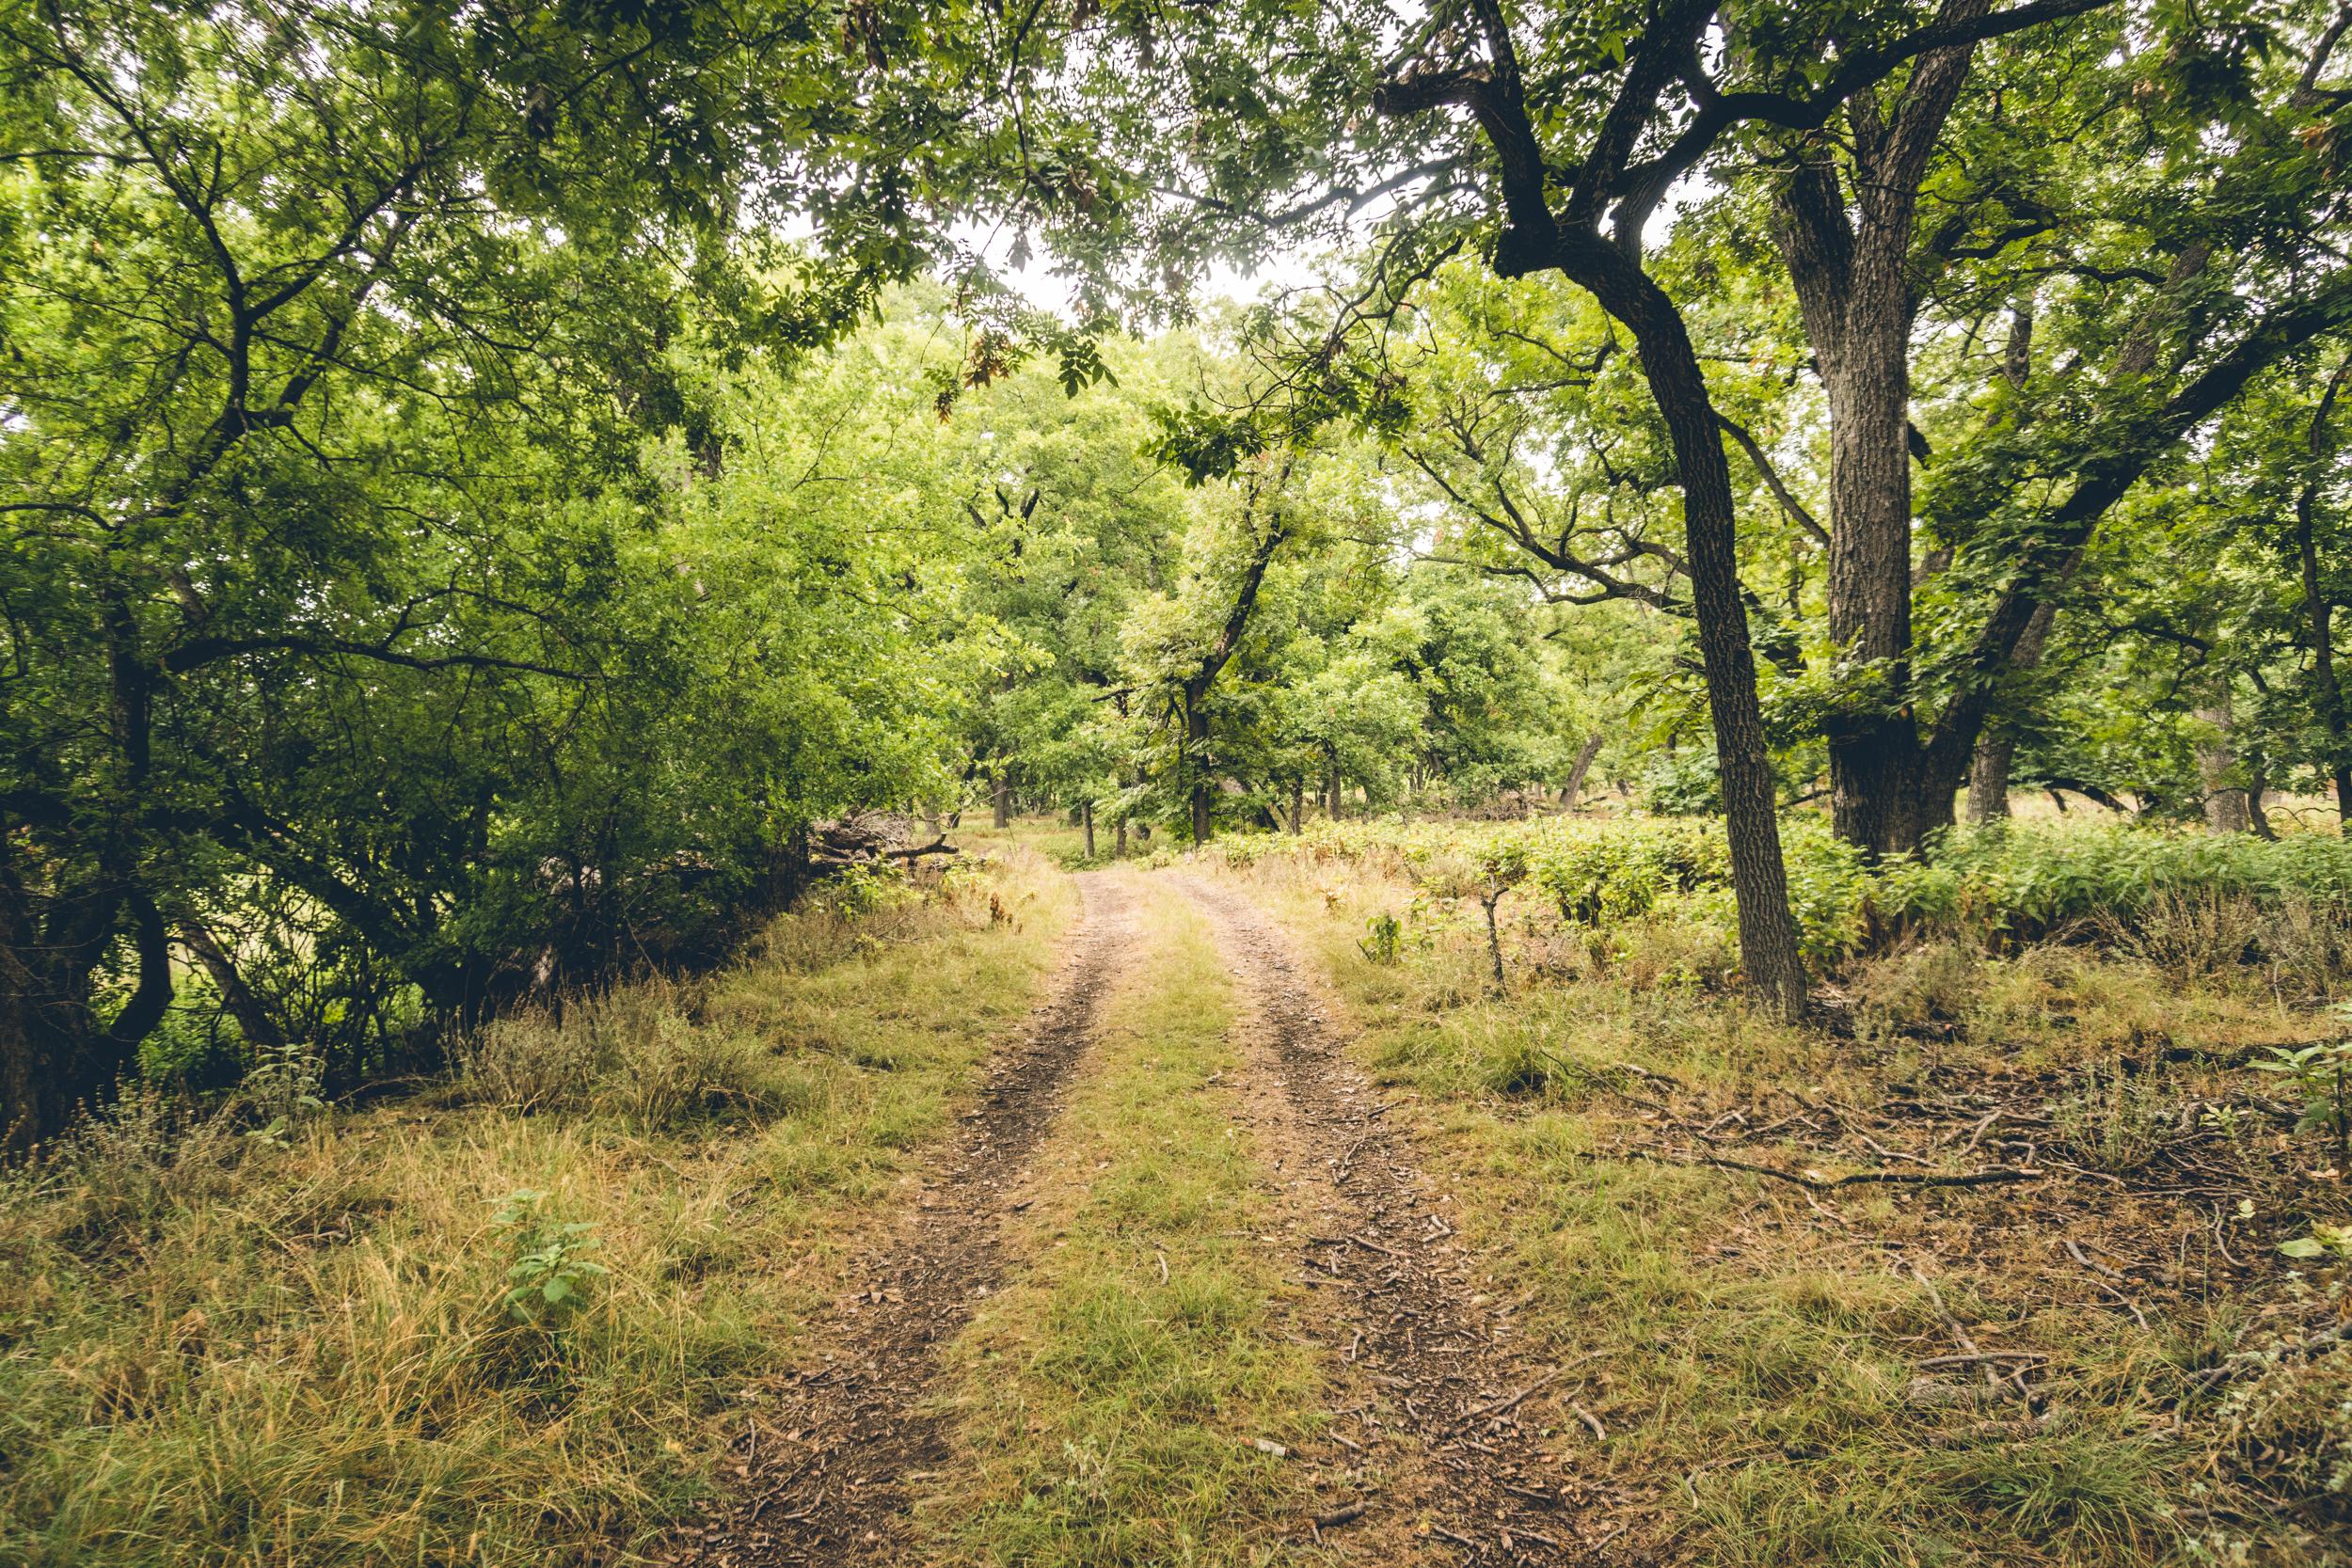 1808_Illano-River-State-Park-7.jpg